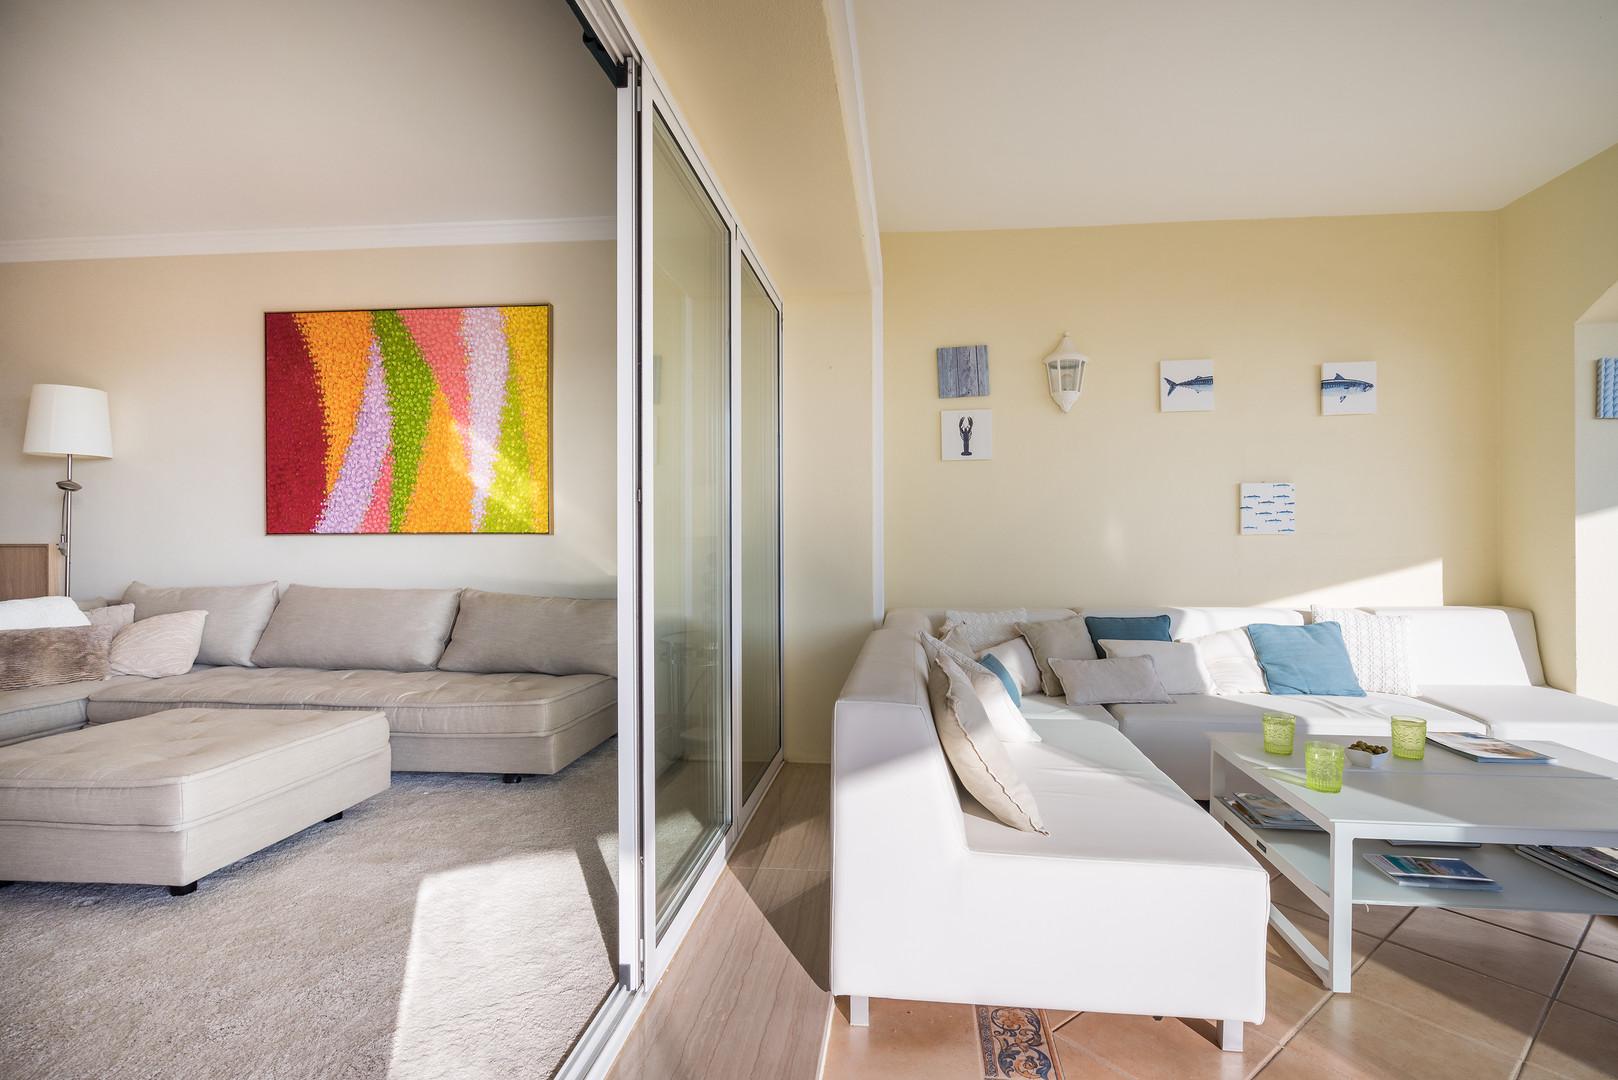 w15 apartment next to heritage resort pl